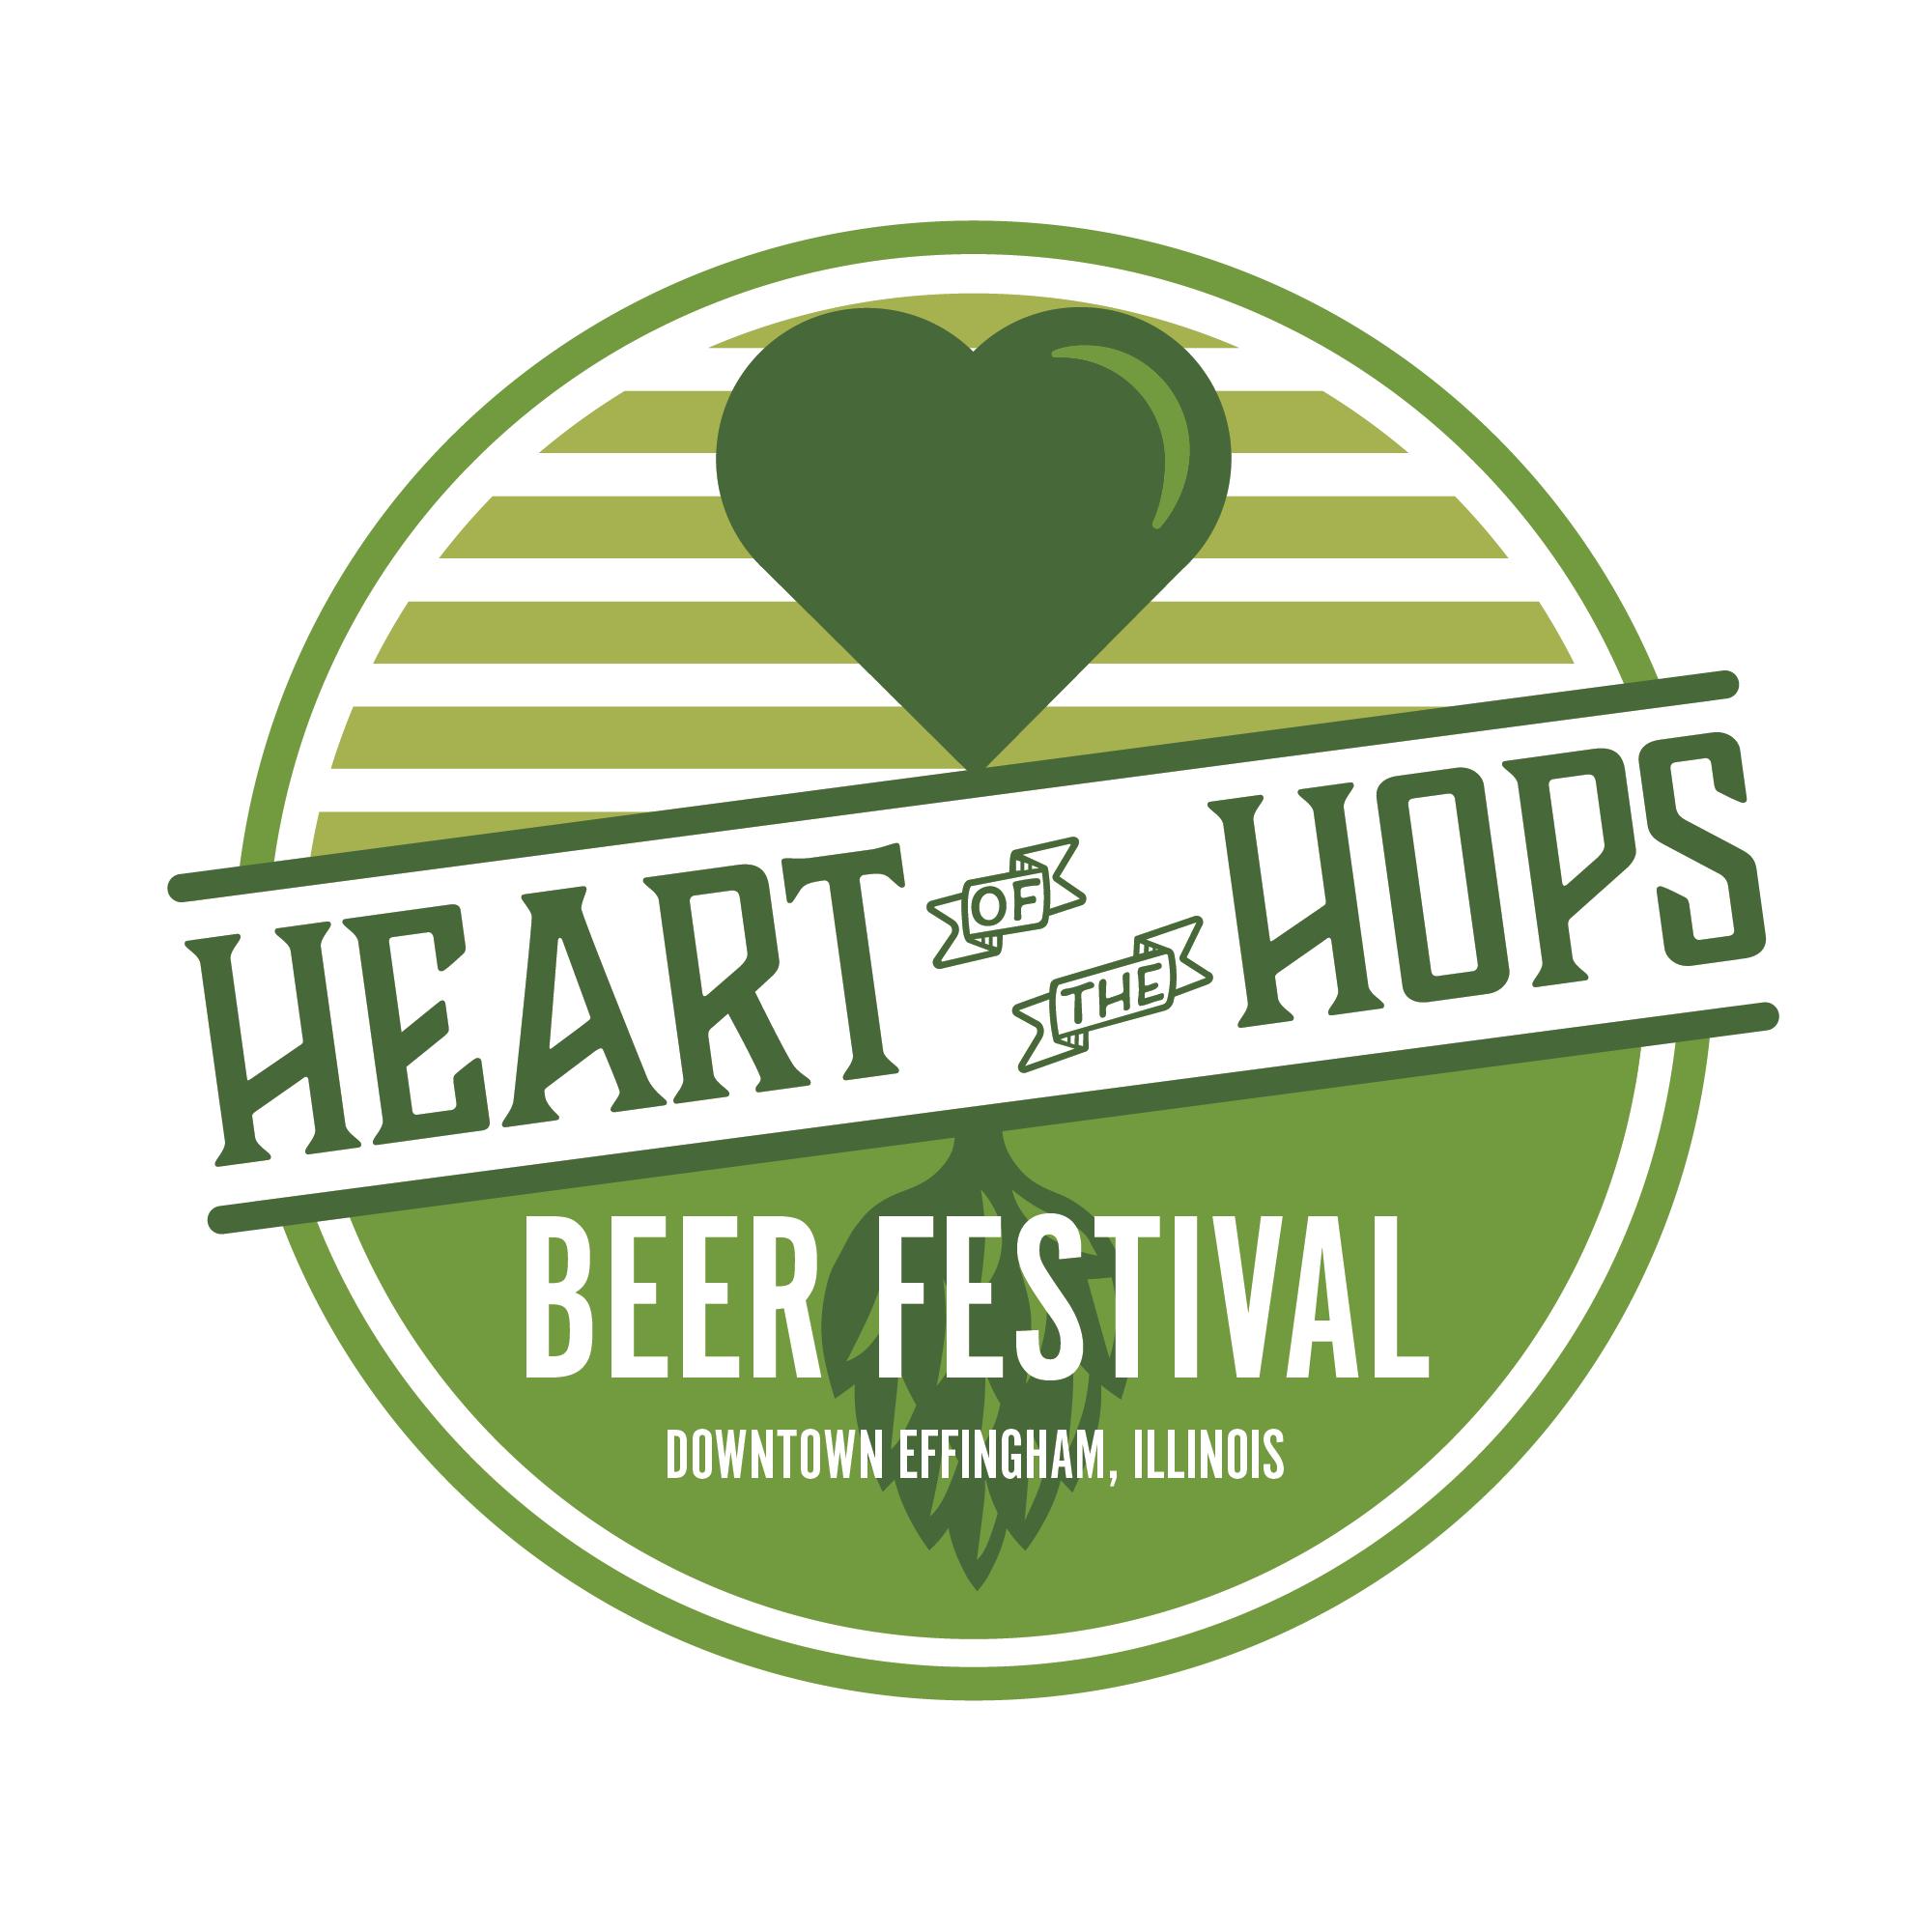 Craft beer festival logo branding design by Hagan Design Co Champaign Illinois